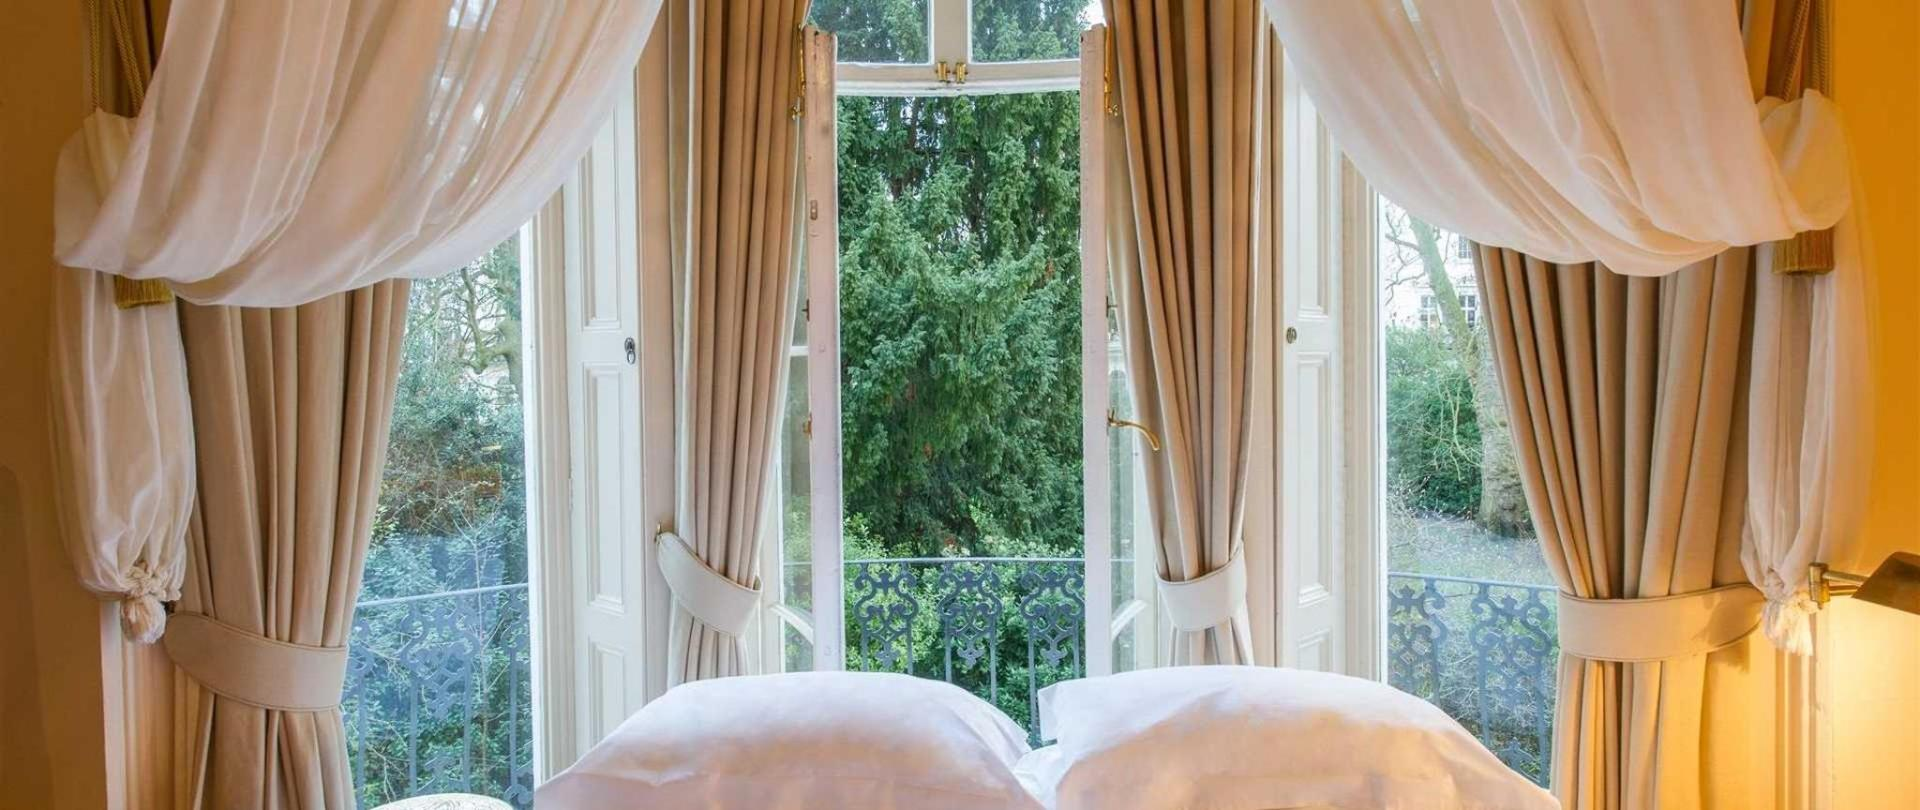 exceptional-room-bed-1.jpg.1920x810_default.jpeg